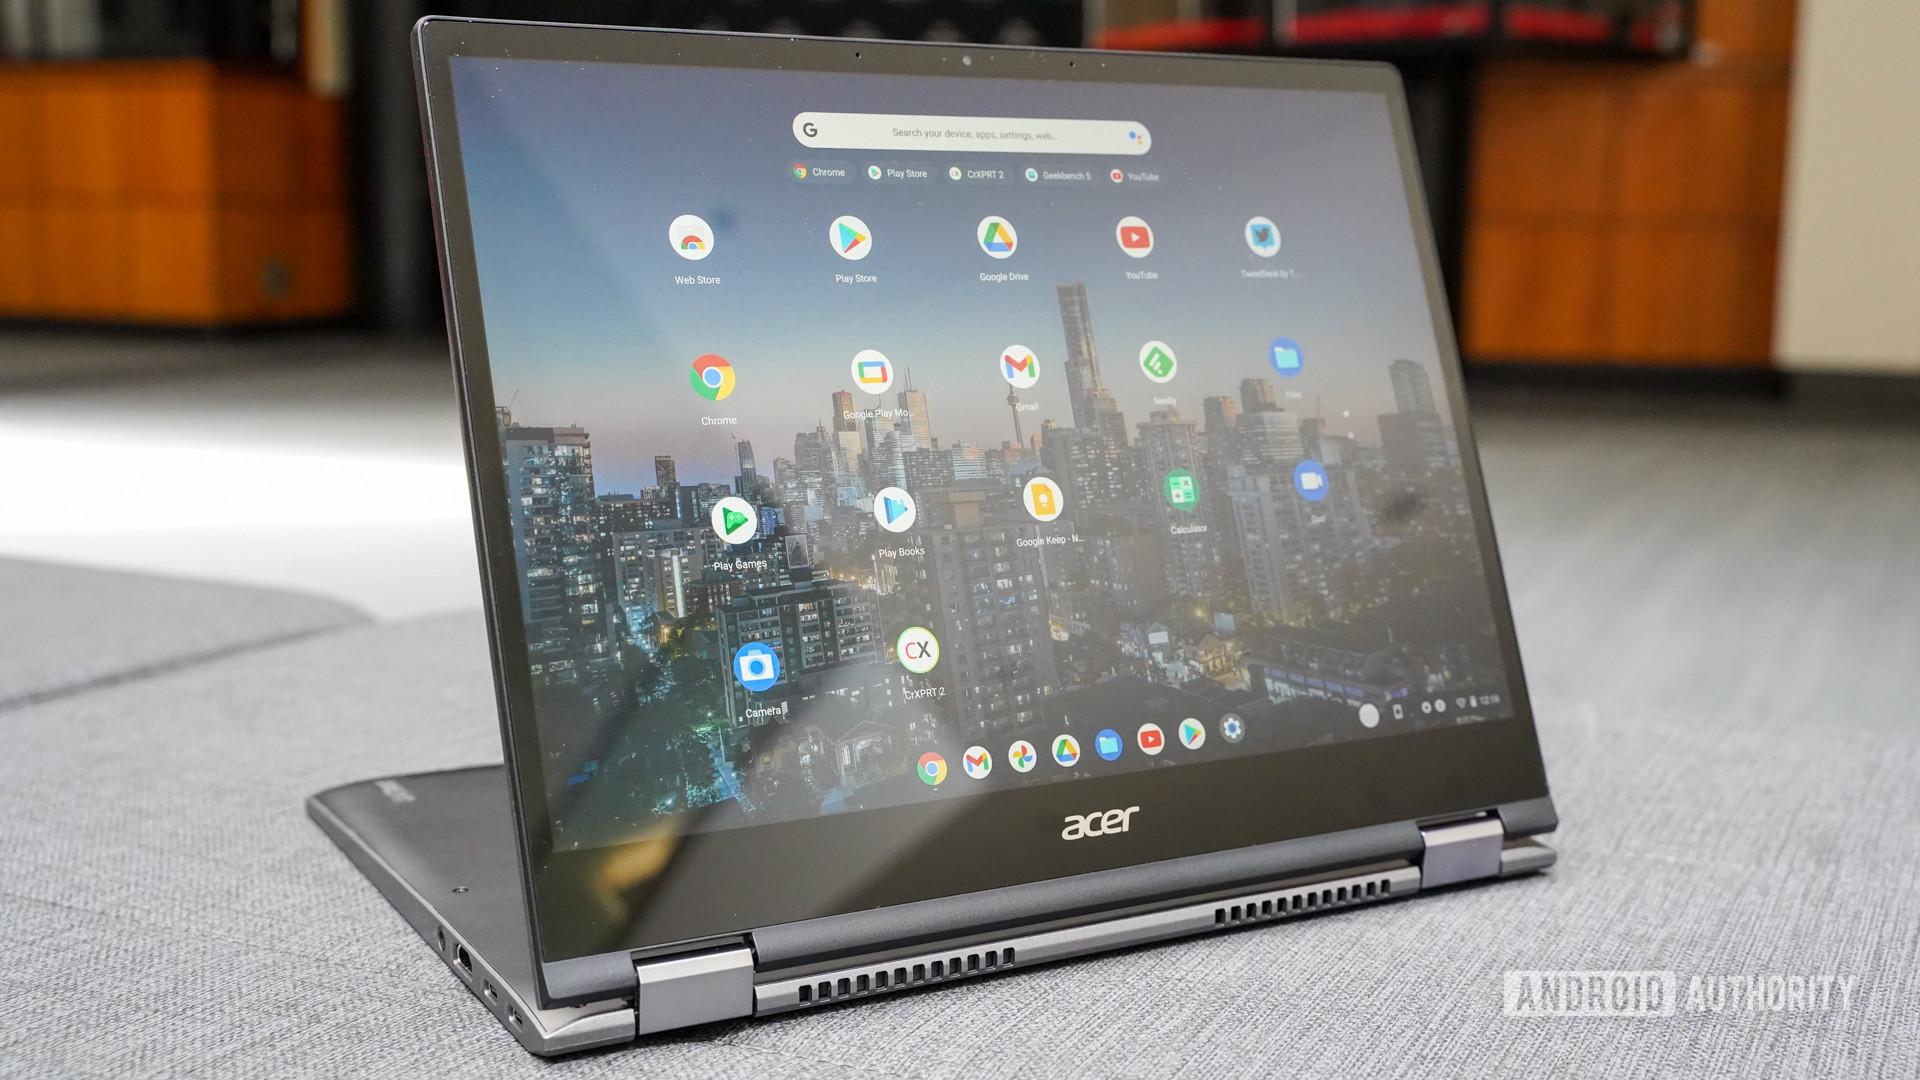 Acer Chromebook Spin 713 presentation mode